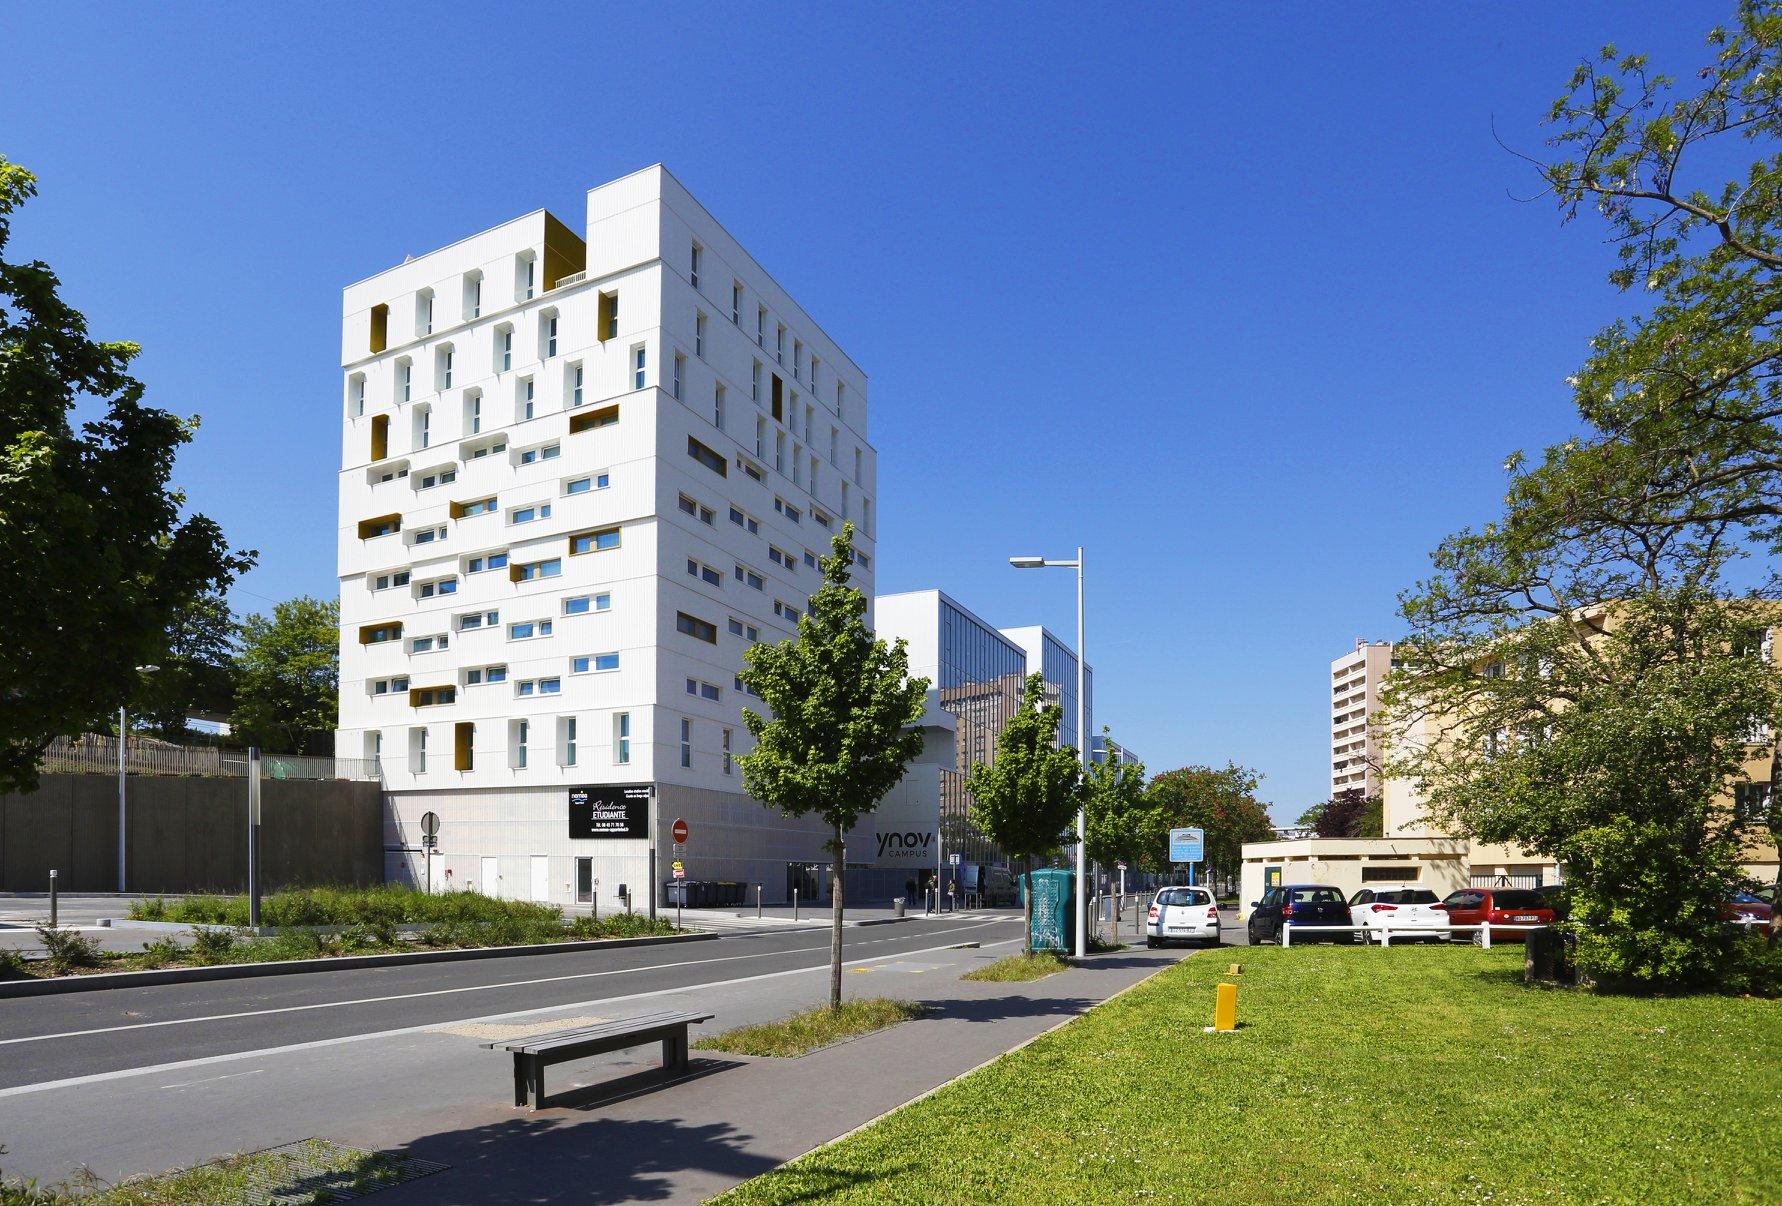 Nanterre Campus, Nanterre